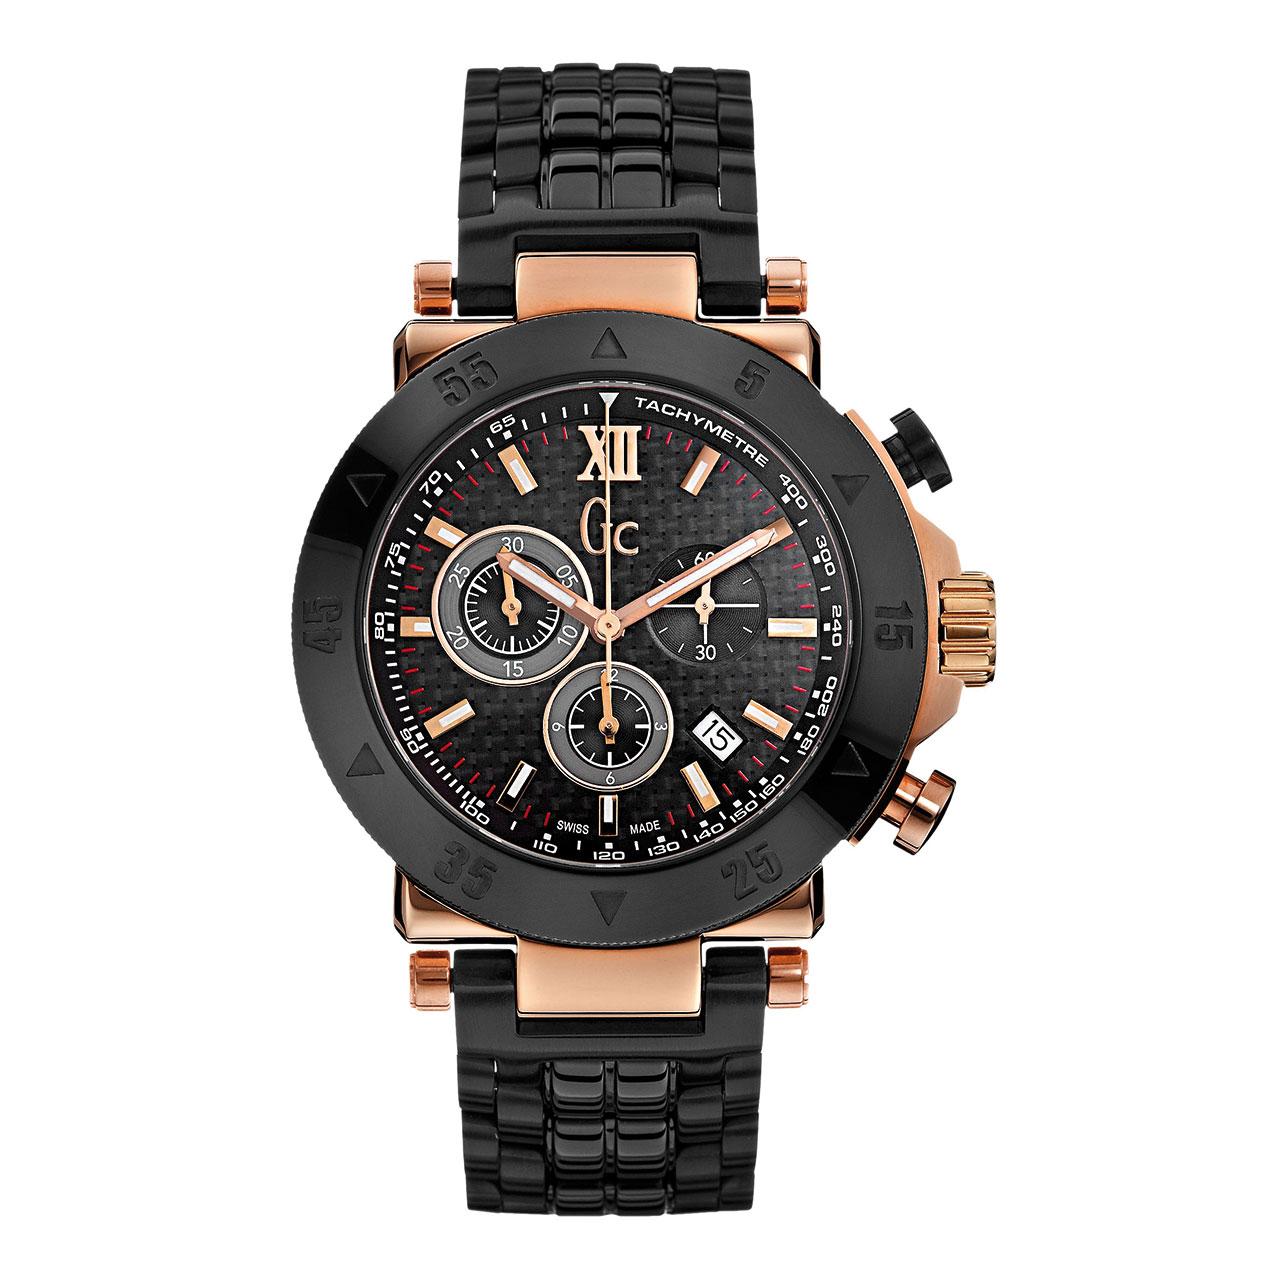 luxury cars and watches boxfox1 gc gc 1 sport